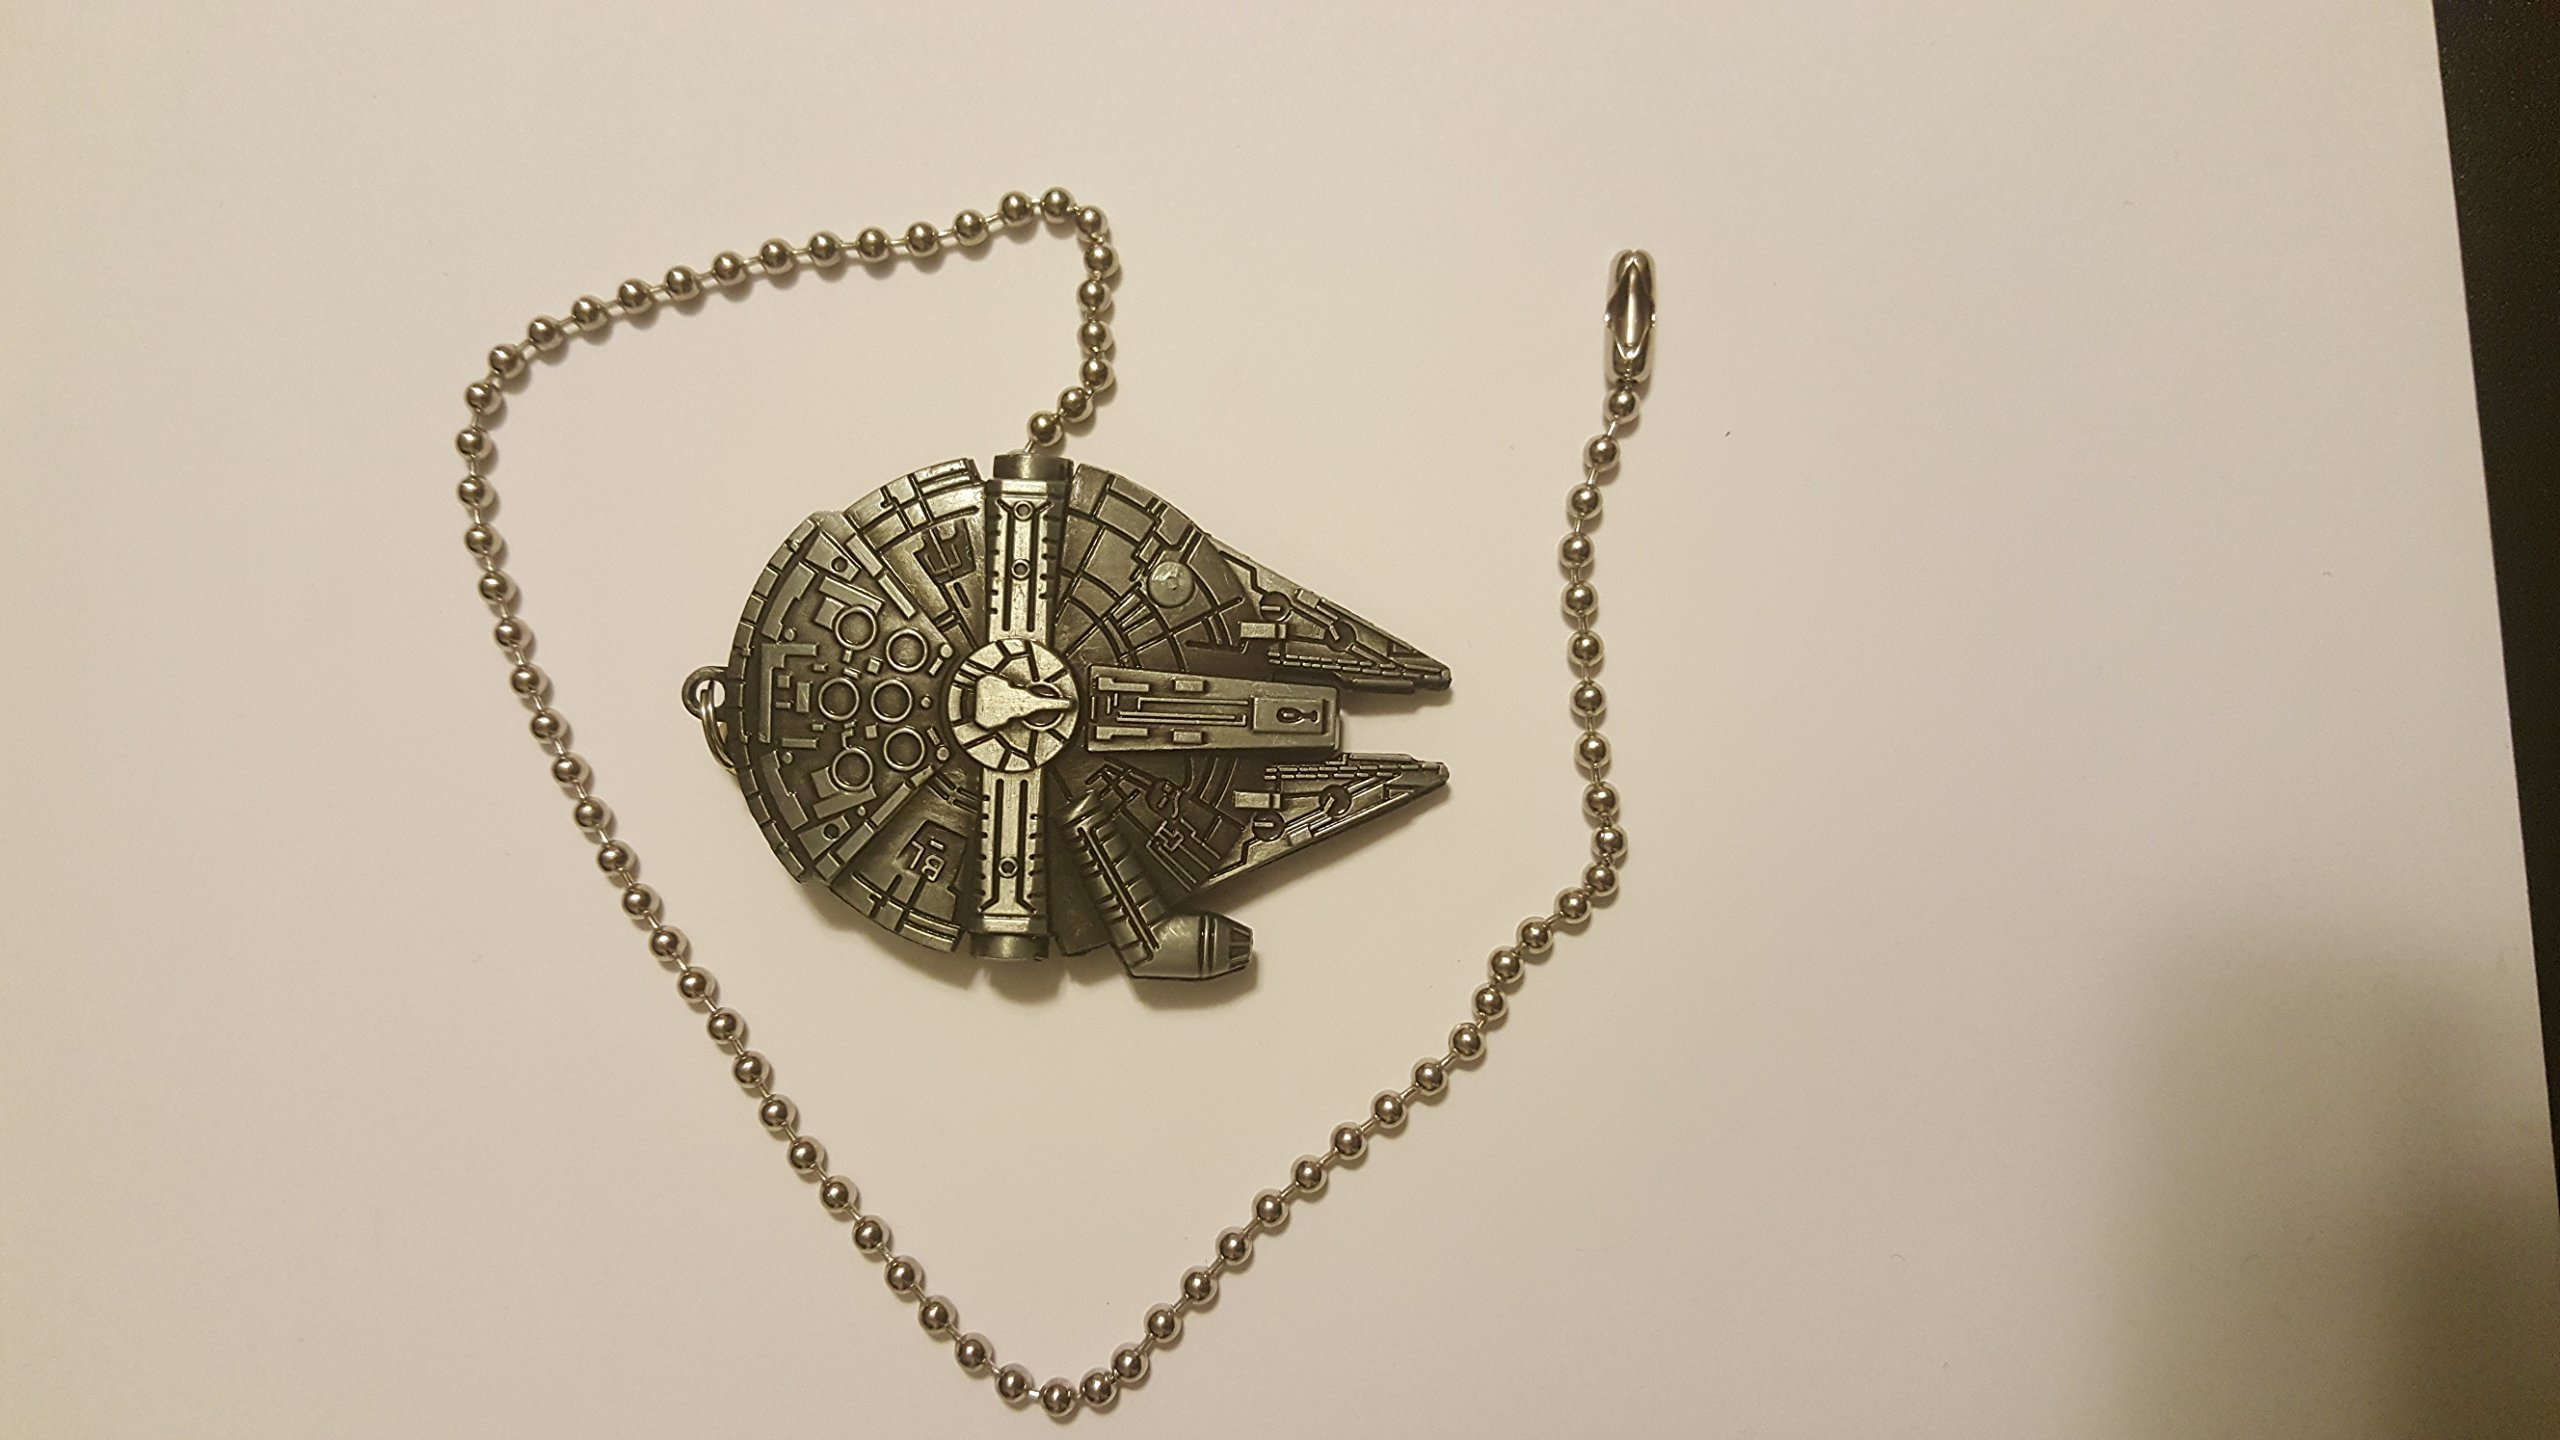 Star Wars Millennium Falcon Ceiling Fan Light Kit Beaded Pull Chain Antique Silver